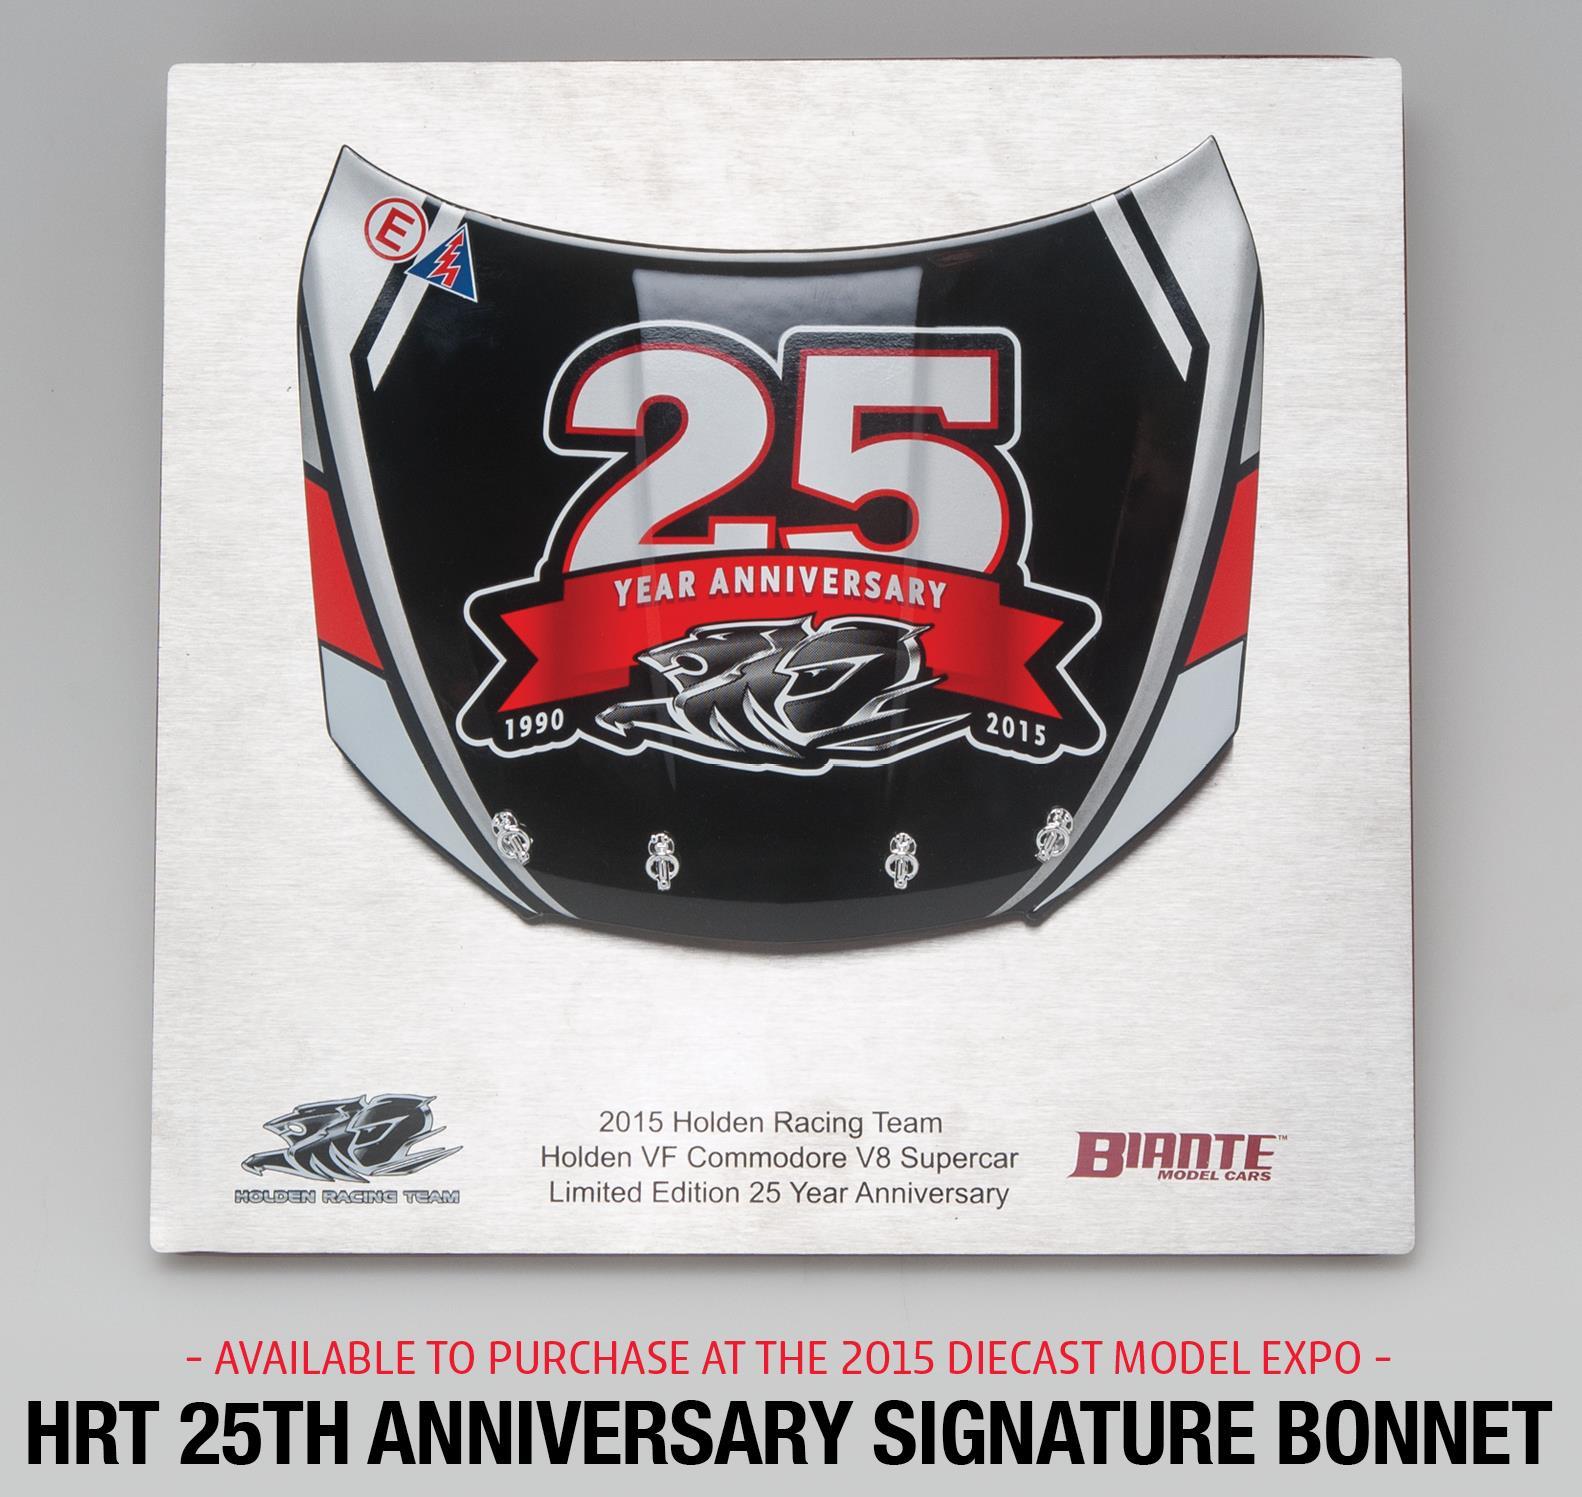 Biante HRT 25th anniversary bonnet